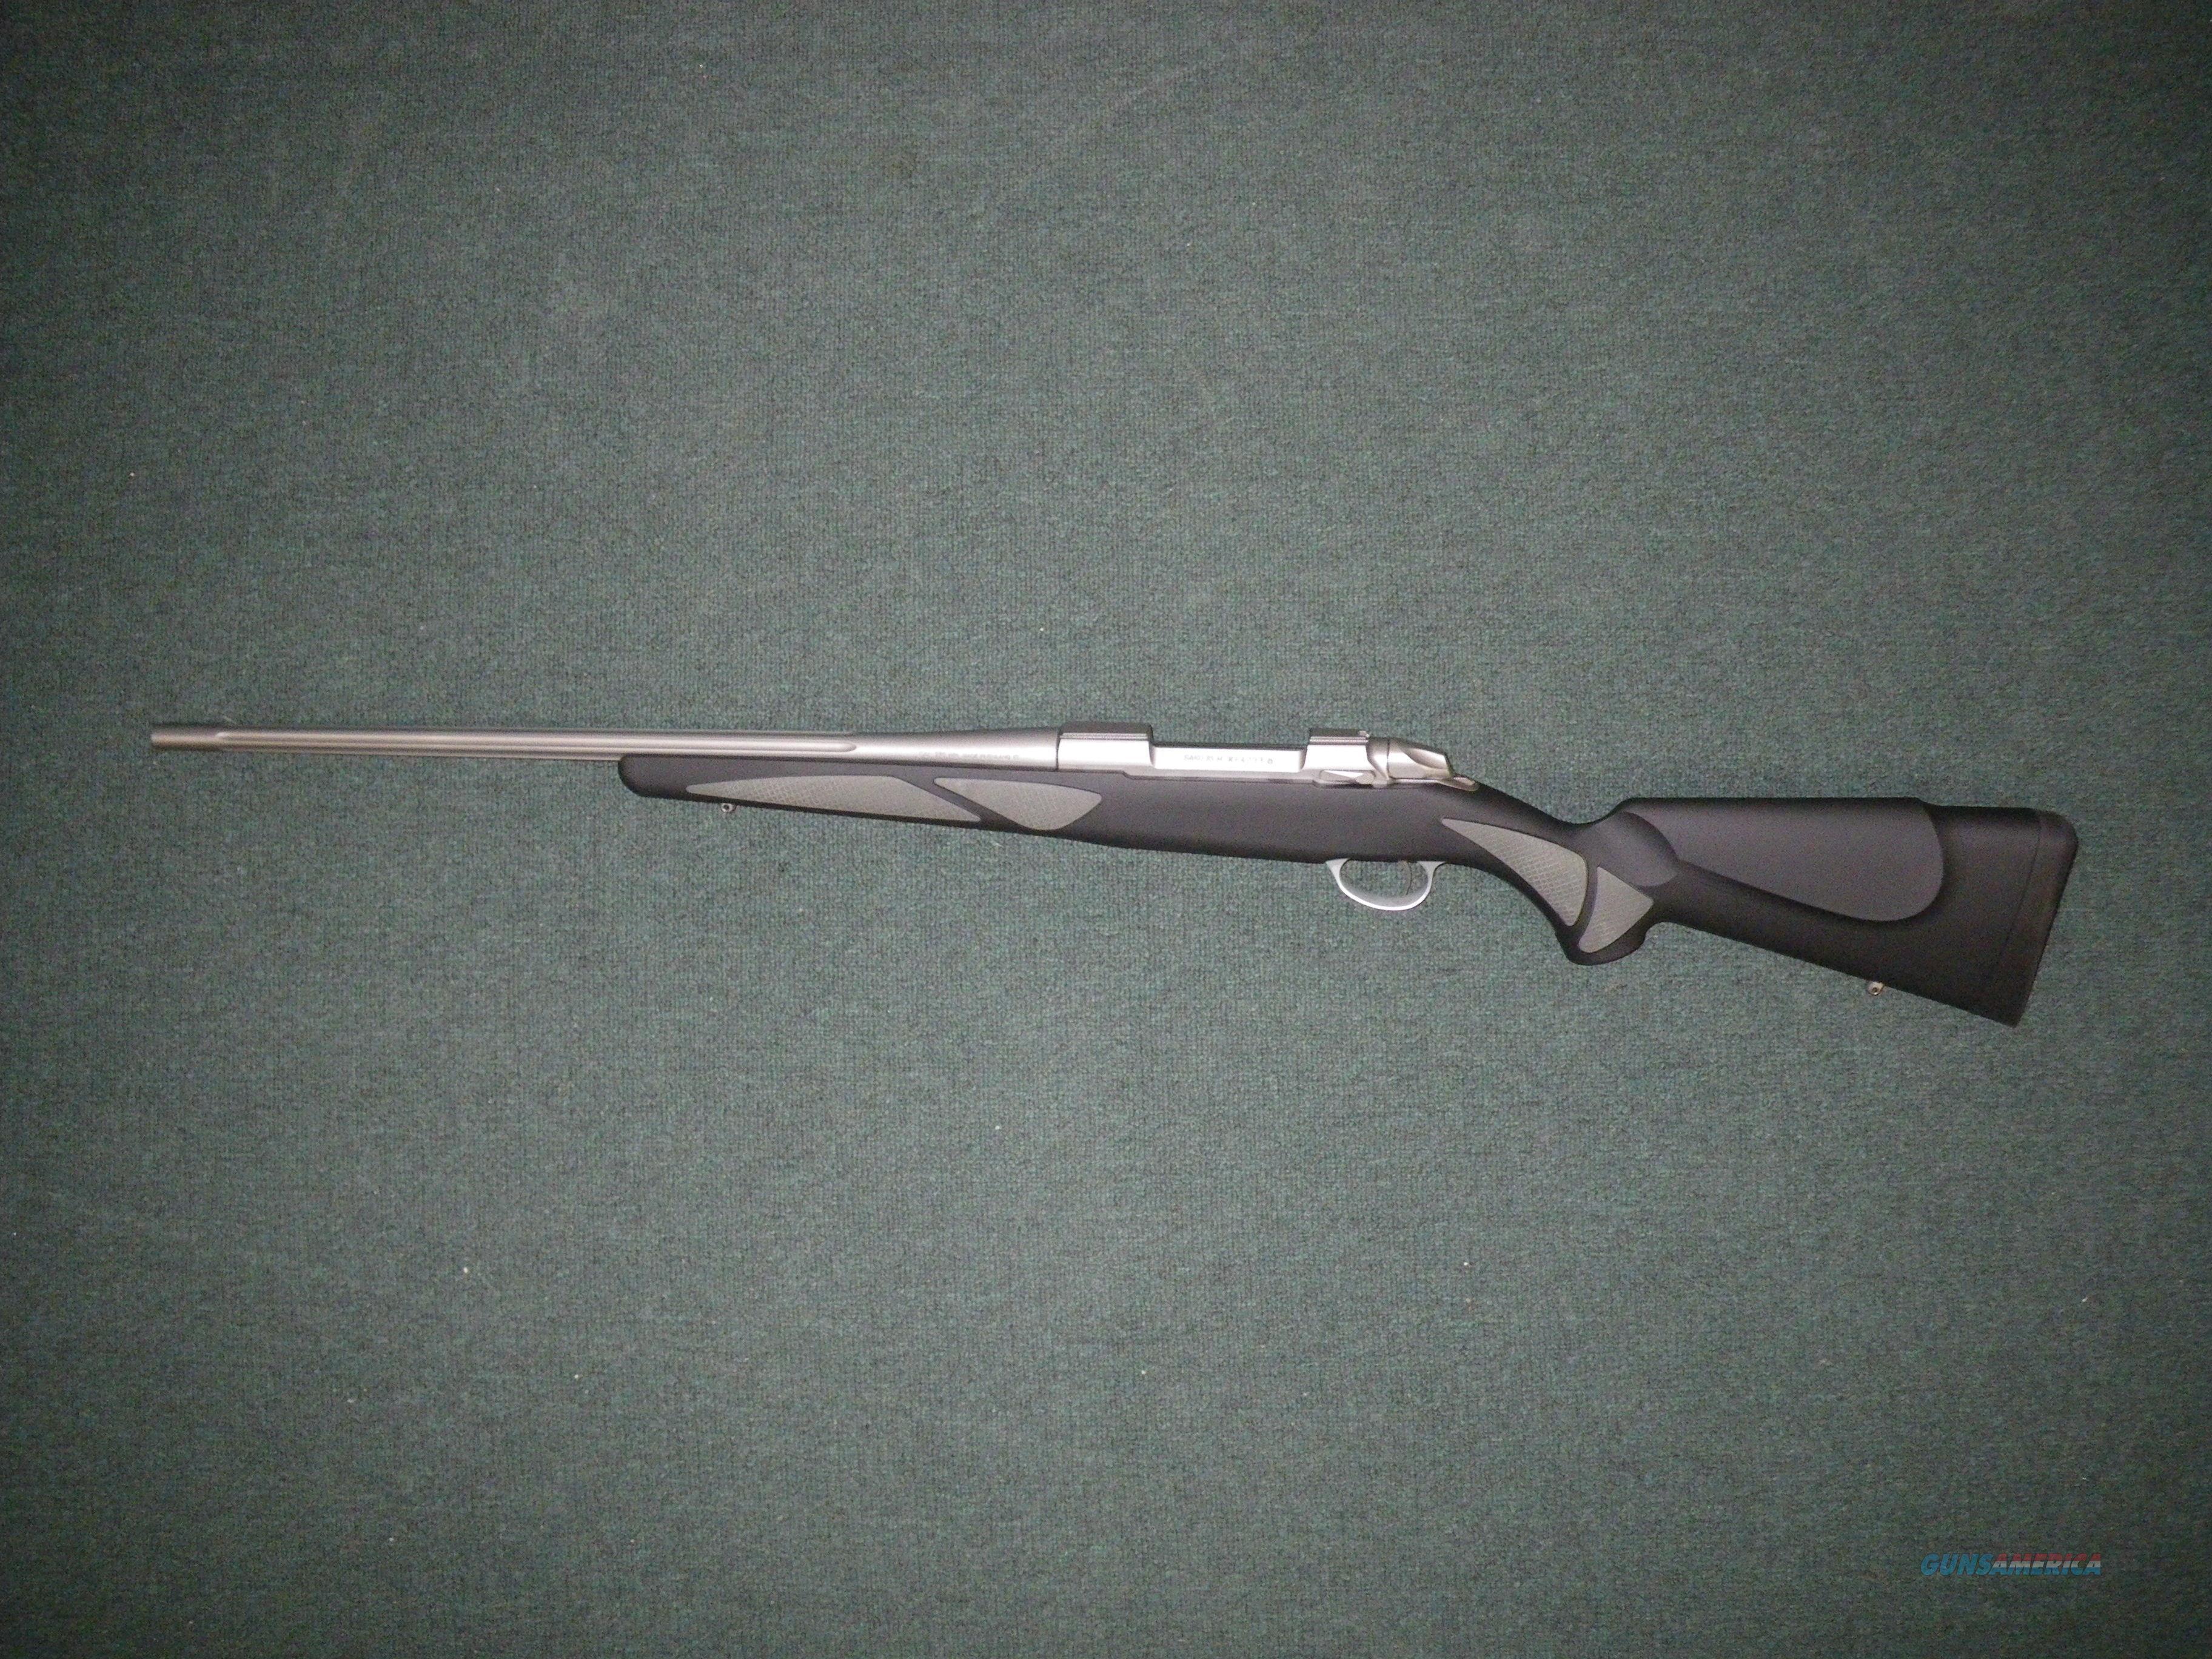 "Sako 85 Finnlight 270 WSM 24.4"" Stainless NEW #JRSFL40  Guns > Rifles > Sako Rifles > M85 Series"